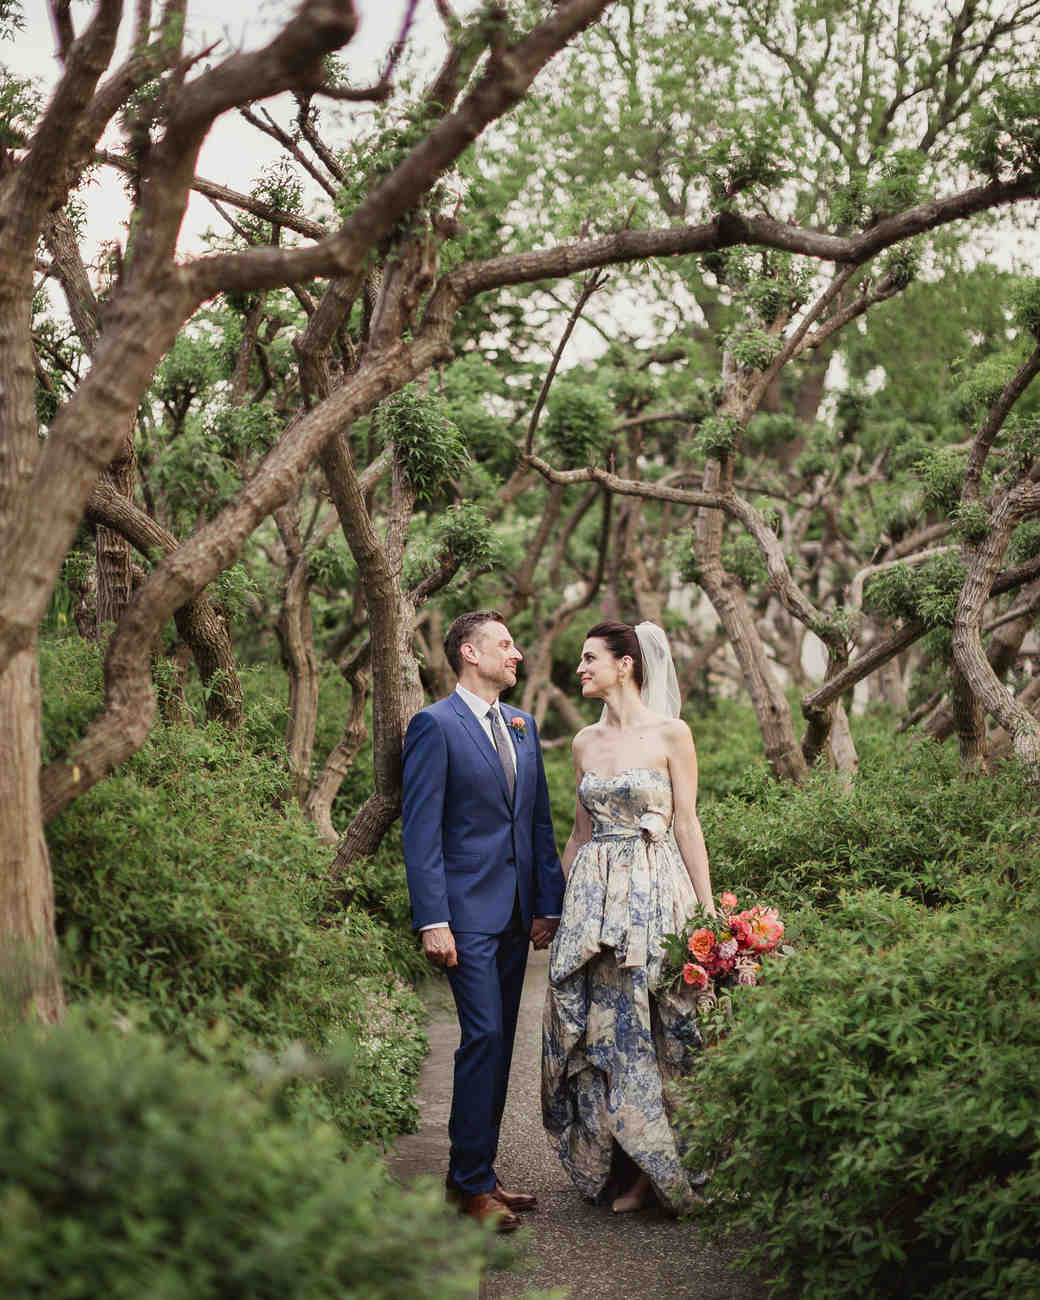 tara-dan-wedding-texas-couple-059-s112848.jpg